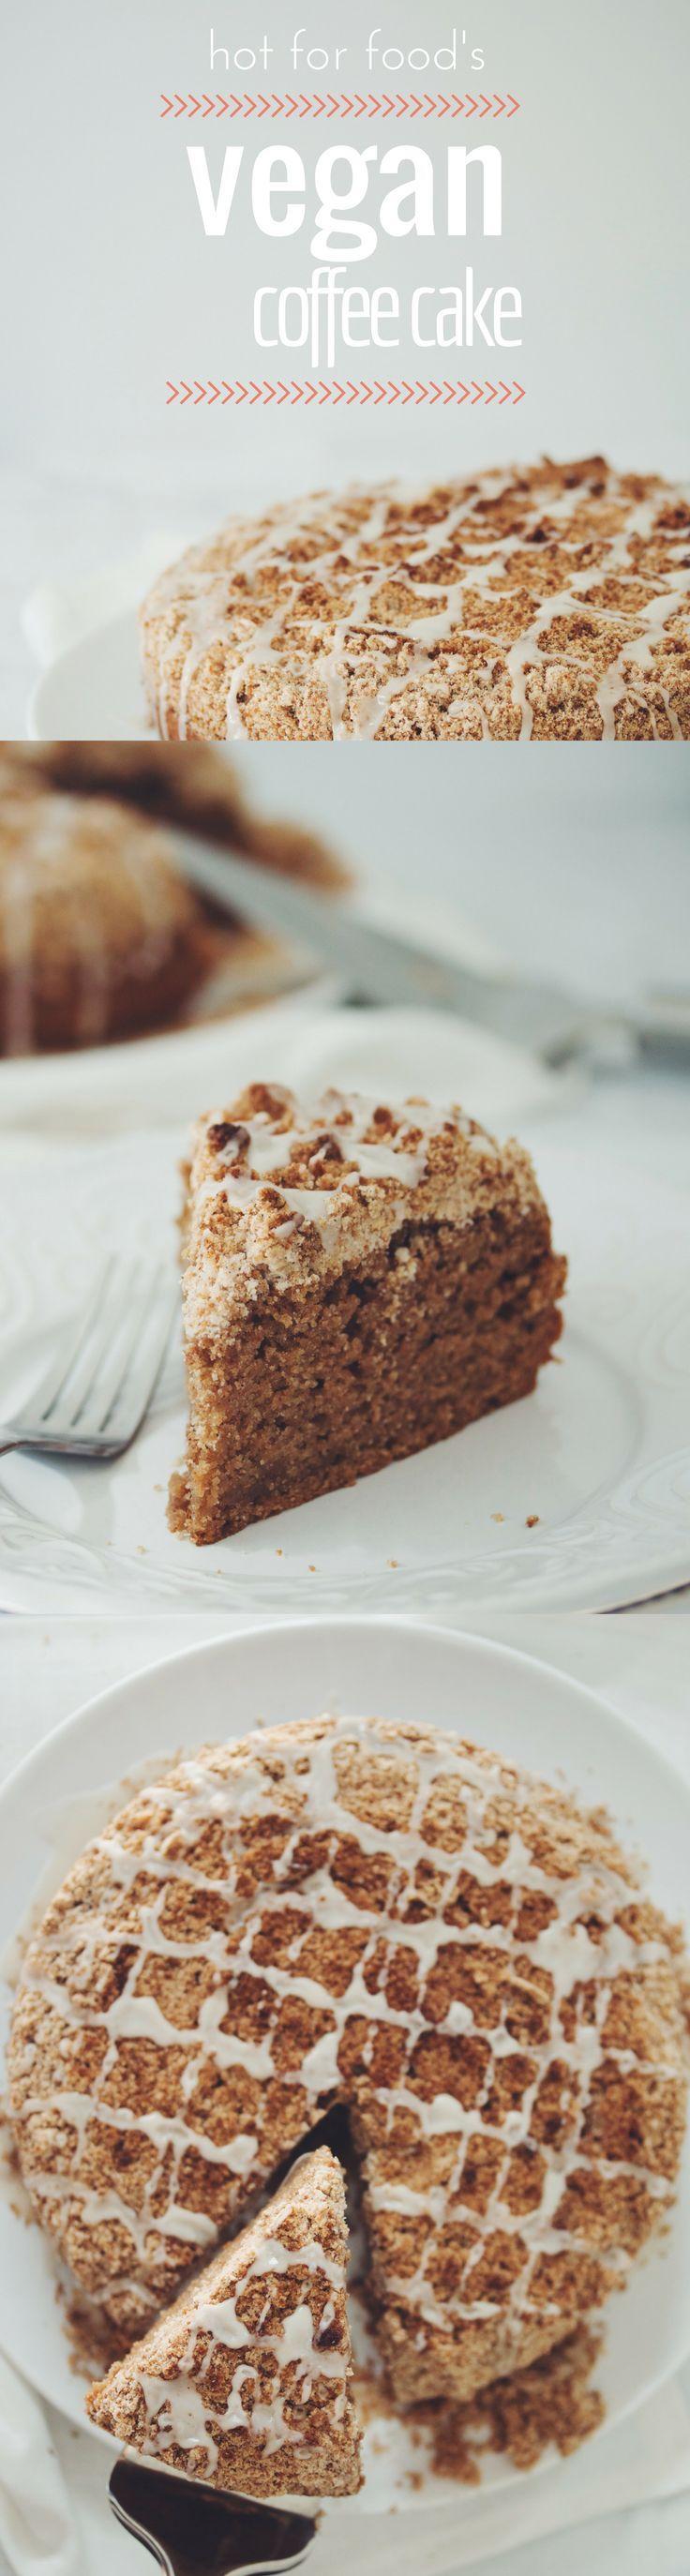 VEGAN COFFEE CAKE   RECIPE on http://hotforfoodblog.com